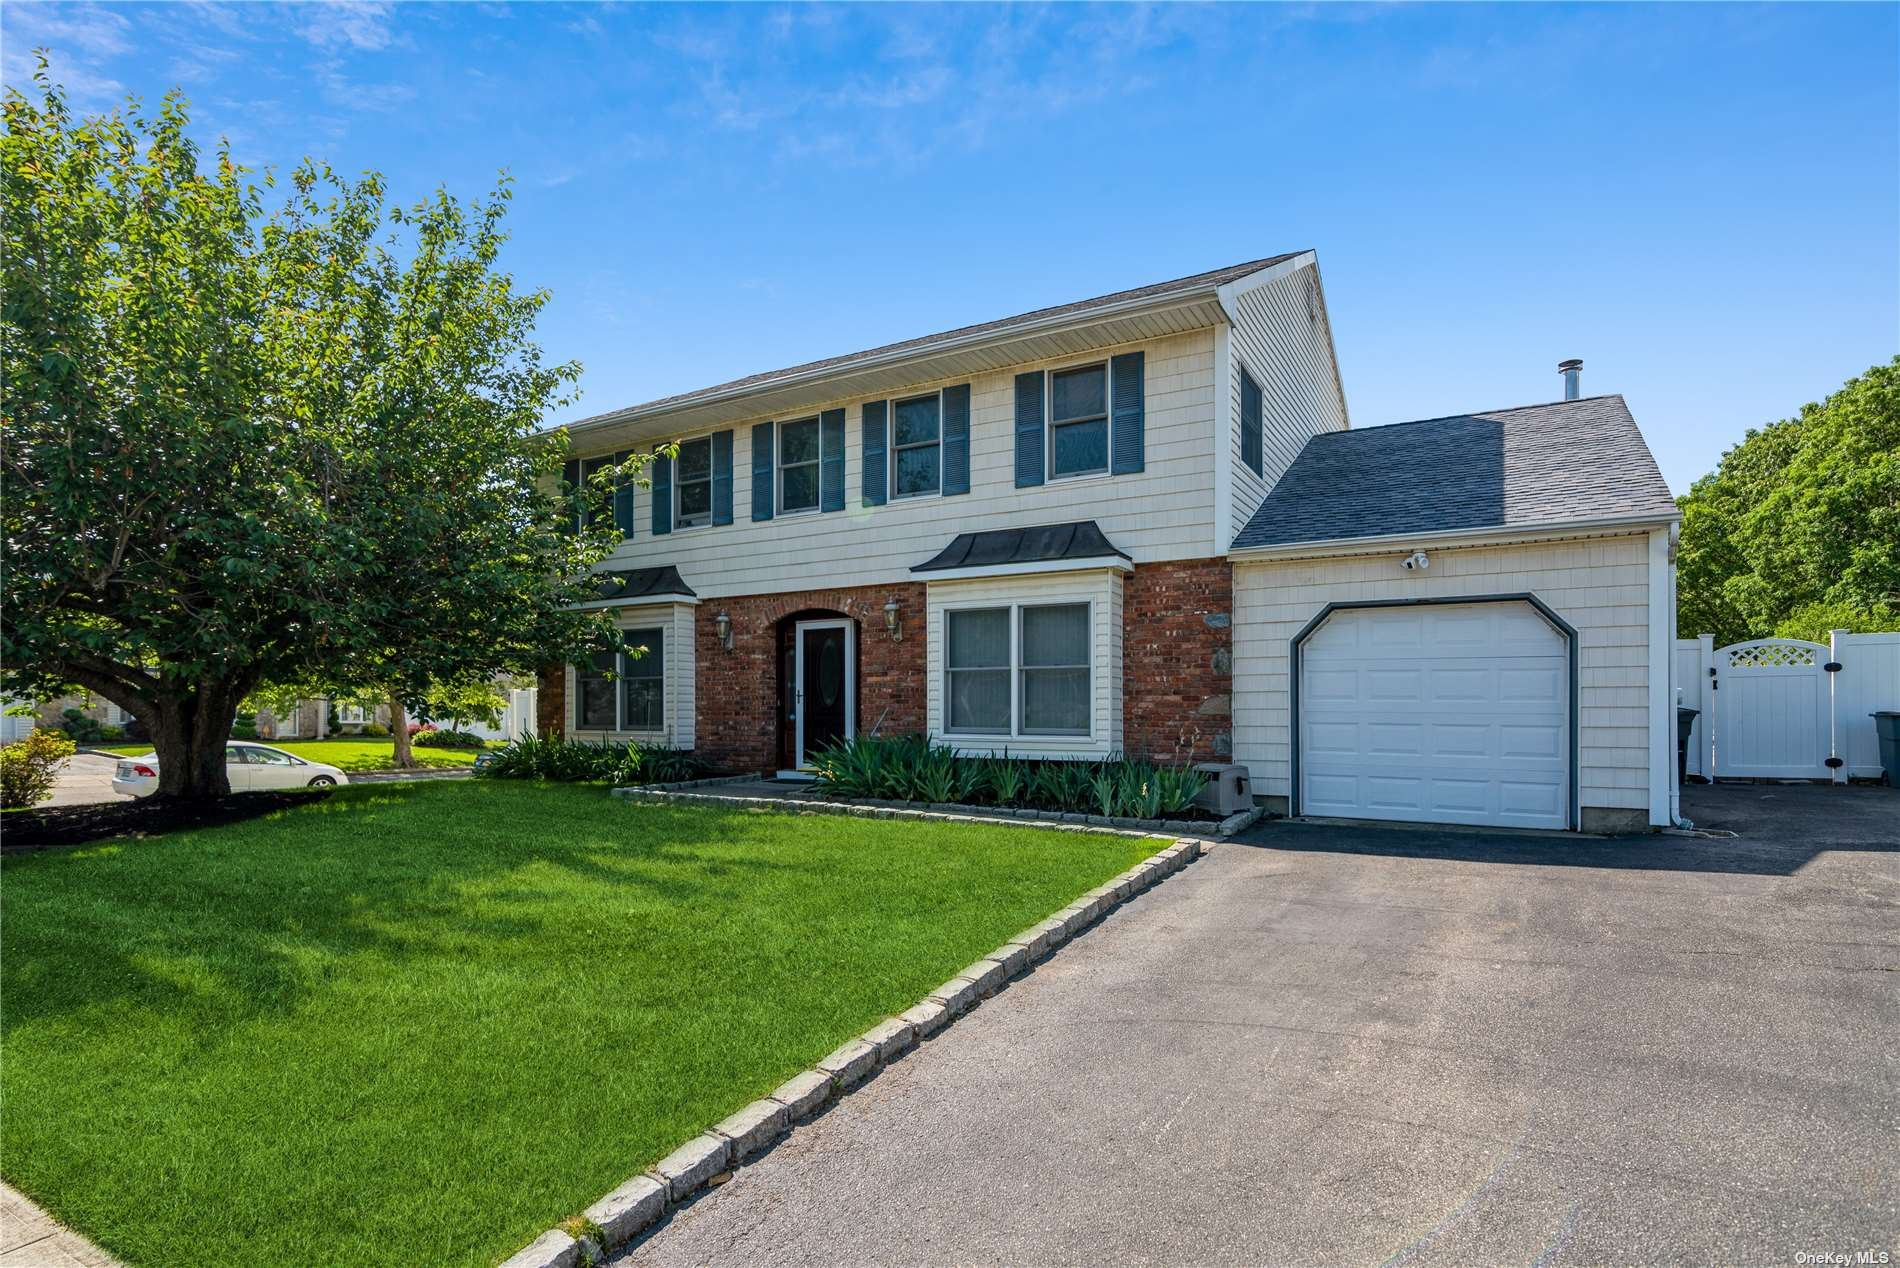 78 Singingwood Drive, Holbrook, NY 11741 - MLS#: 3318663